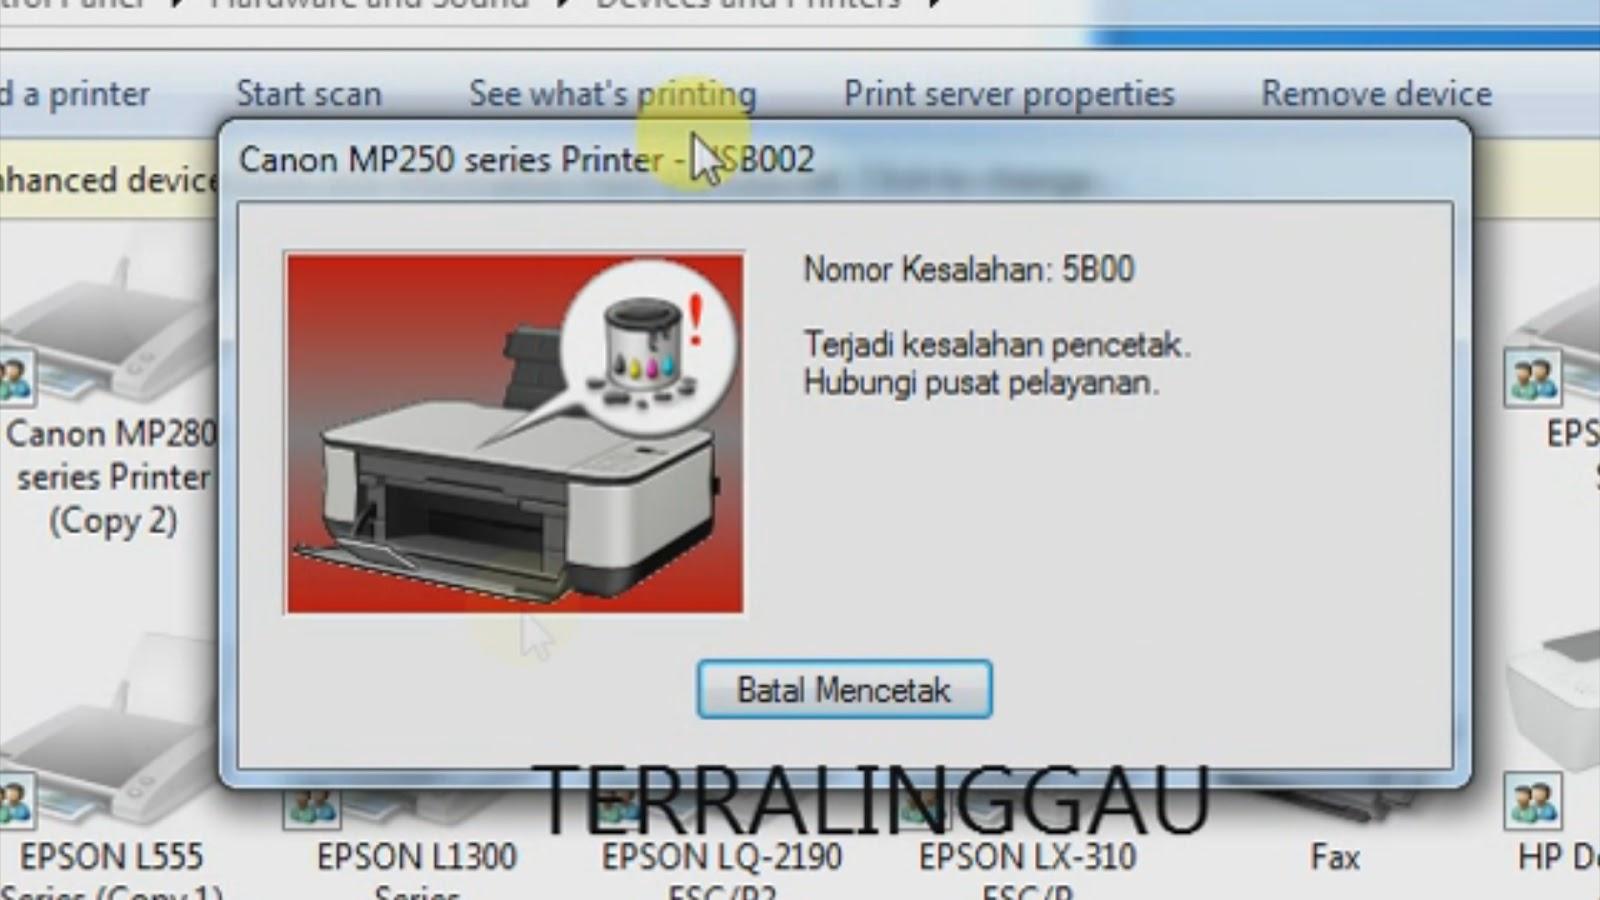 mp258 error code 5b00